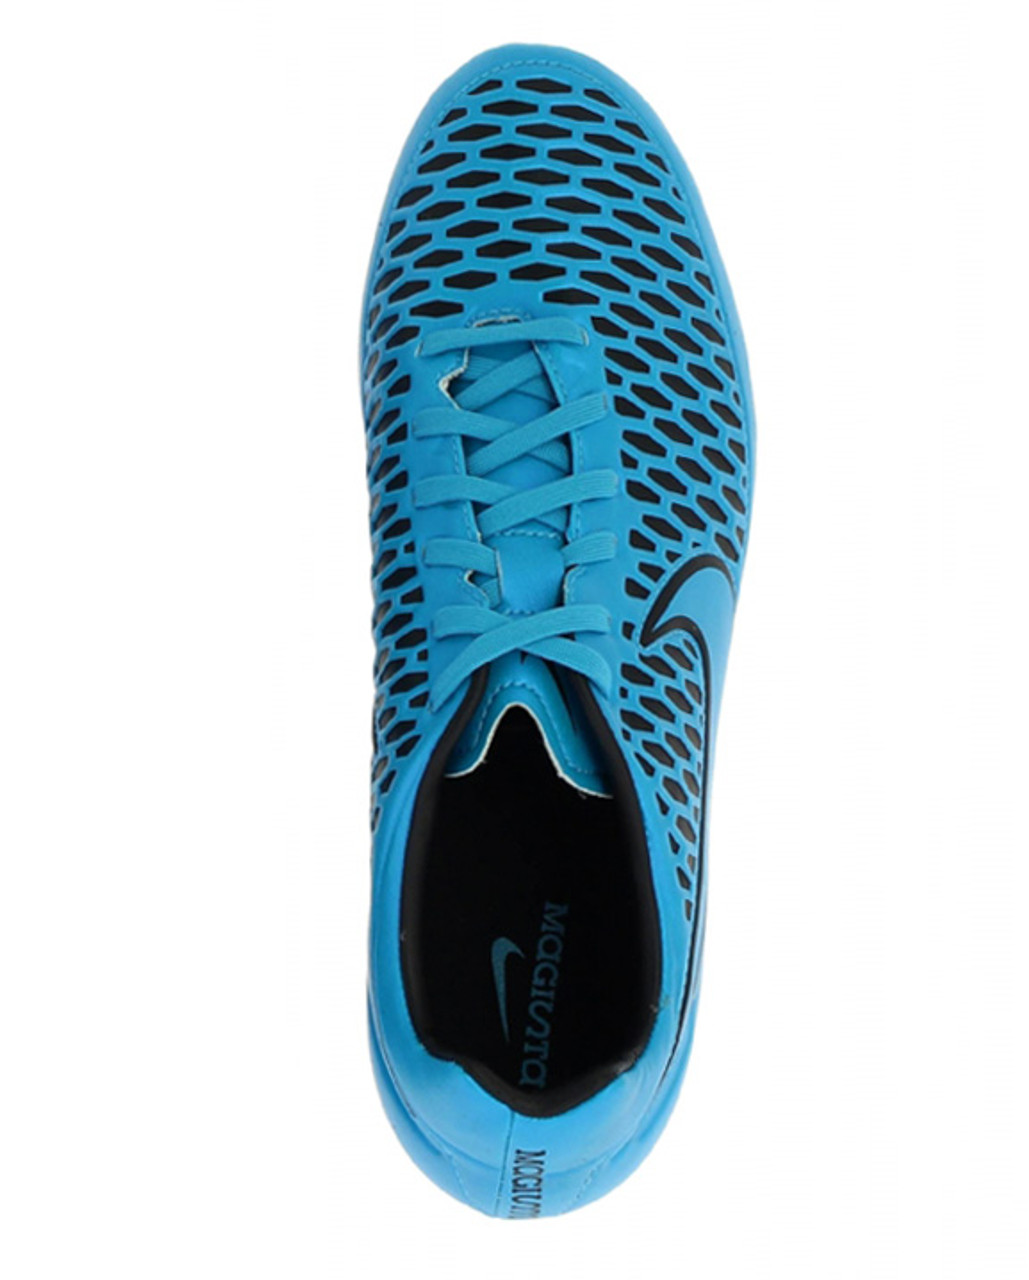 ba045f434 Nike Magista Orden FG - Turquoise Blue Black (030519) - ohp soccer